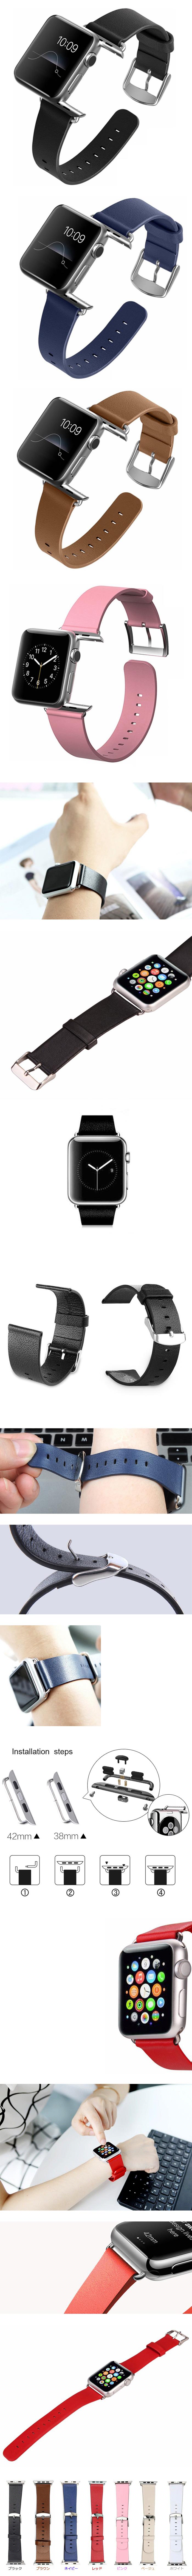 Apple Watch �Х�� �٥�� 42mm 38mm �ܳ� �쥶�� ���åץ륦���å� applewatch�Х�� applewatch�٥��